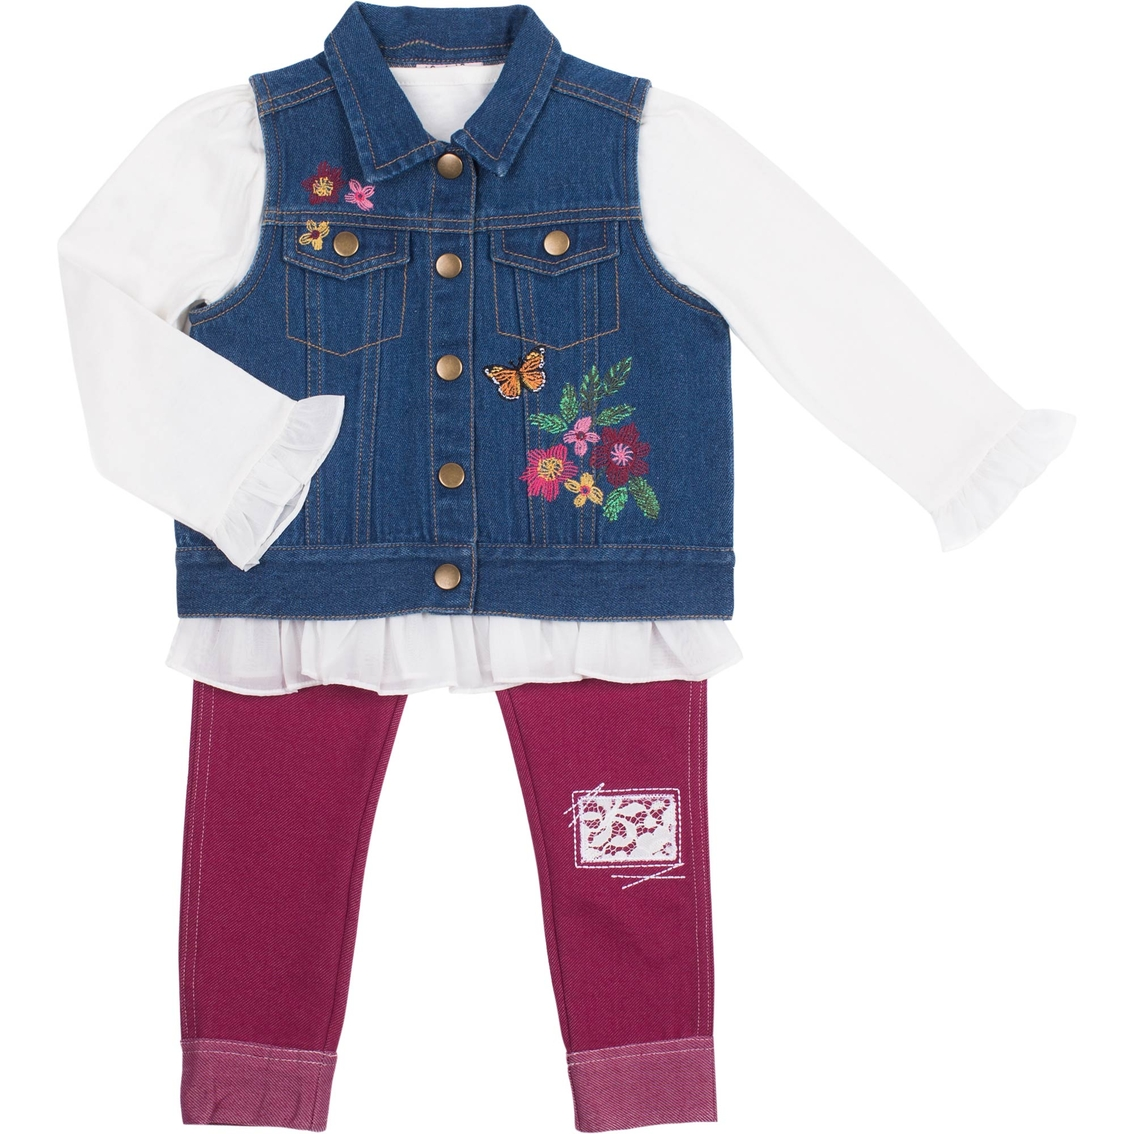 e3f2dd320be4 Little Lass Toddler Girls 3 Pc. Denim Vest Set Embroidery   Toddler ...